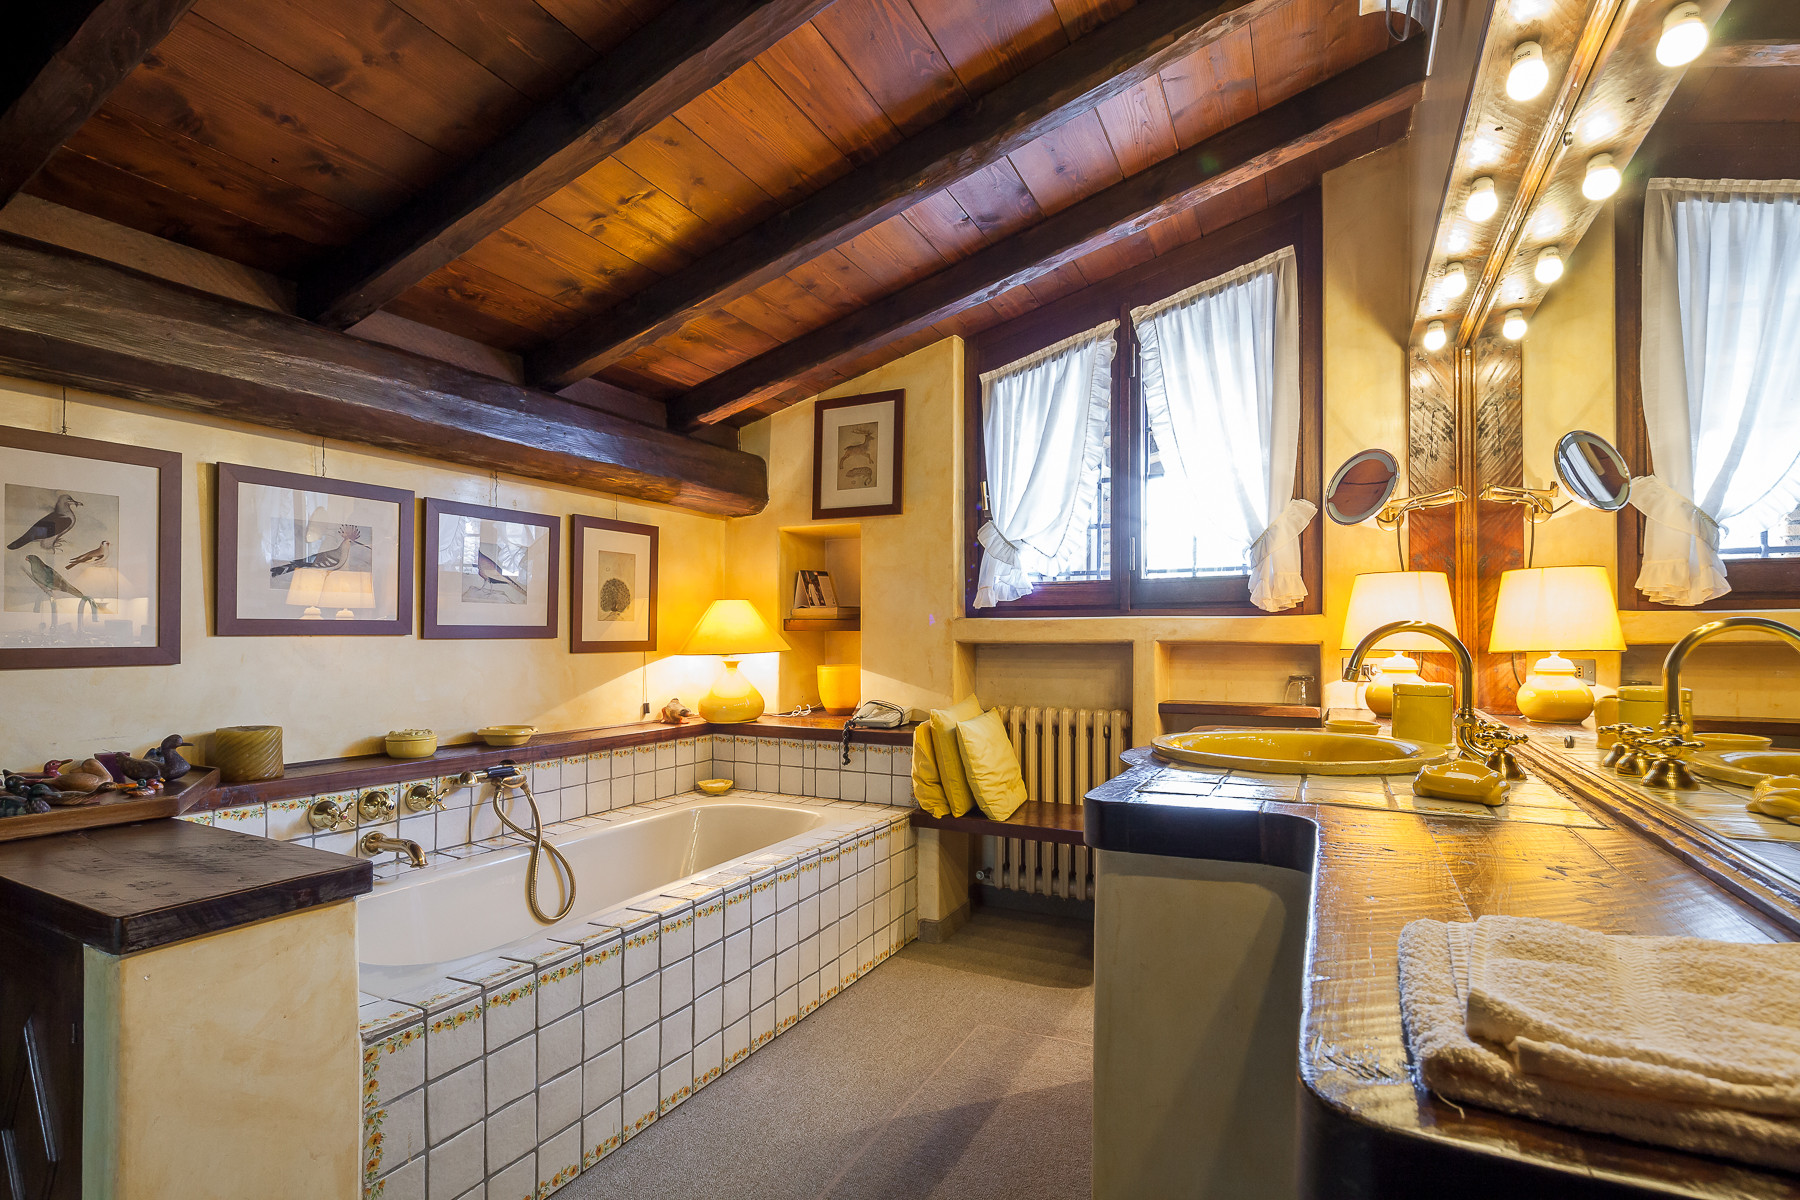 Villa in Vendita a Gorle: 5 locali, 850 mq - Foto 14